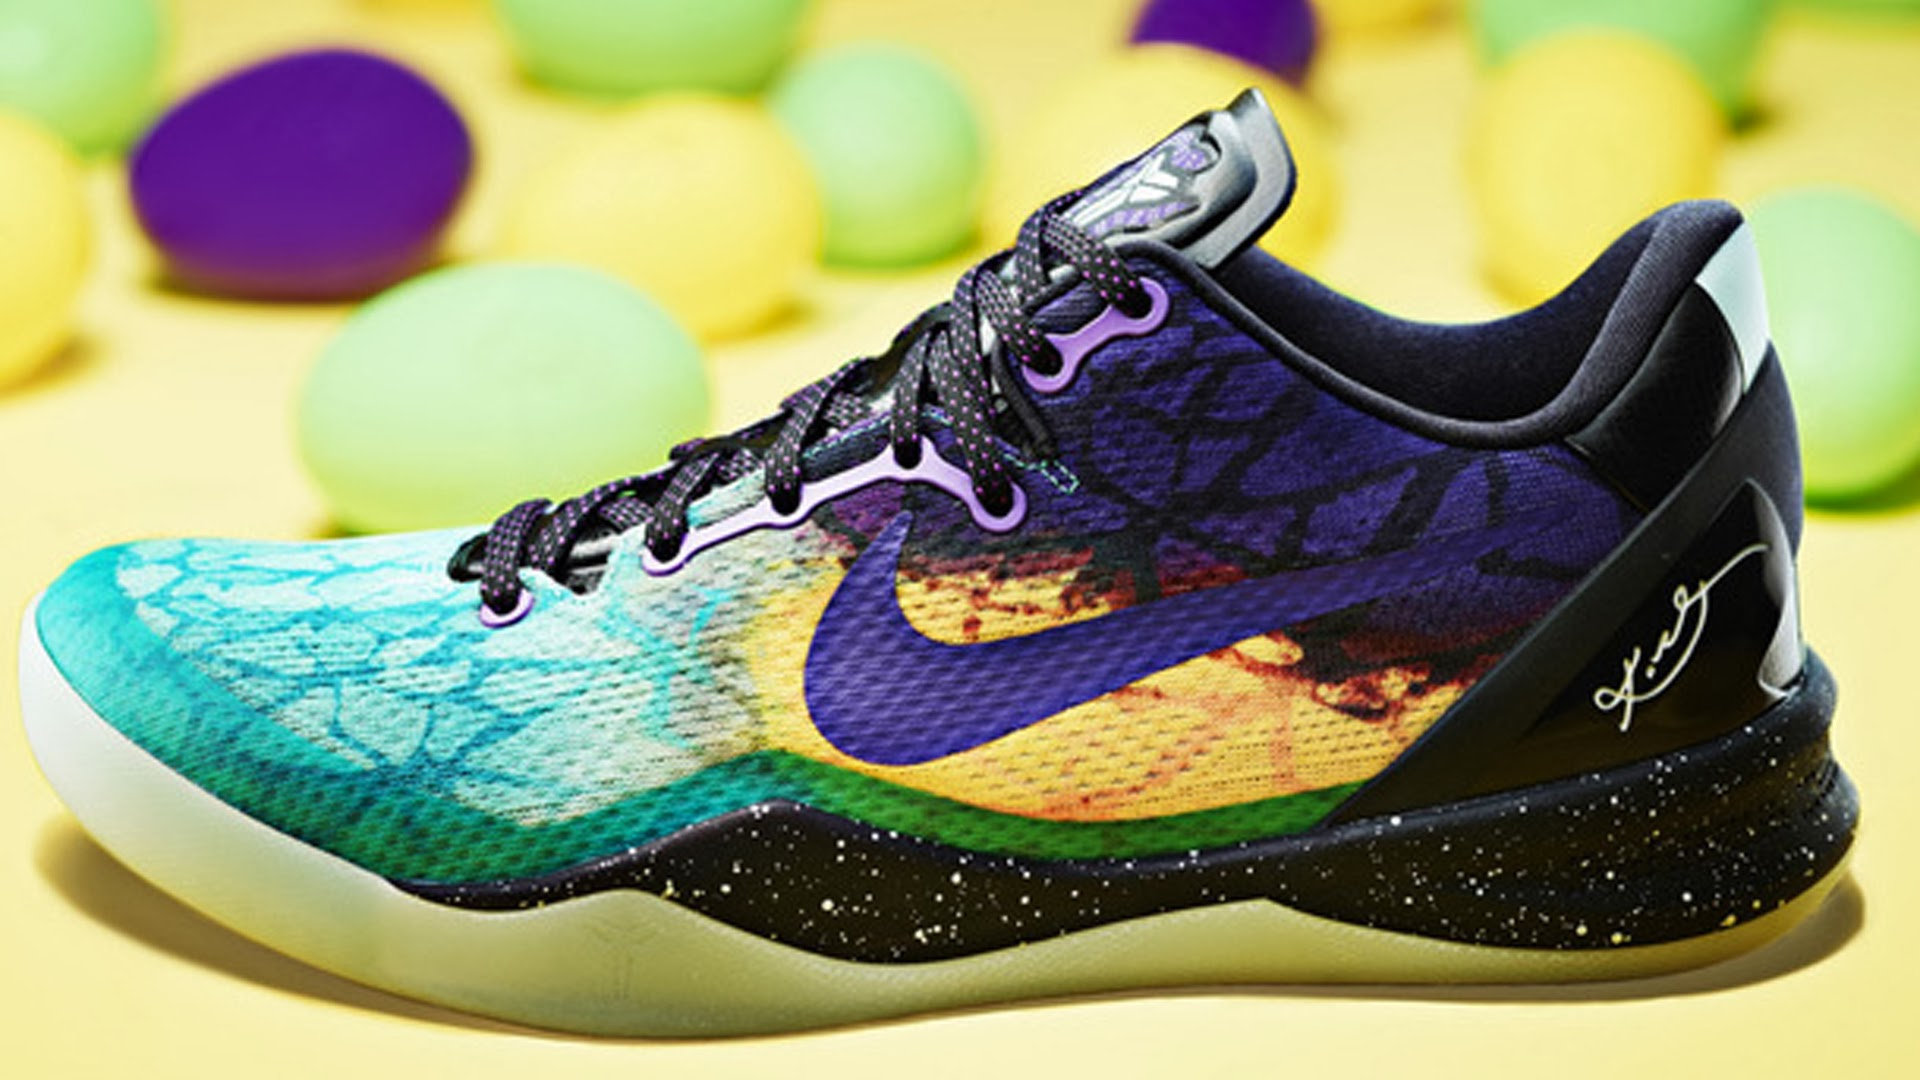 Nike Kobe Bryant 8 Easter Shoes Wallpaper HiresMOVIEWALLcom 1920x1080